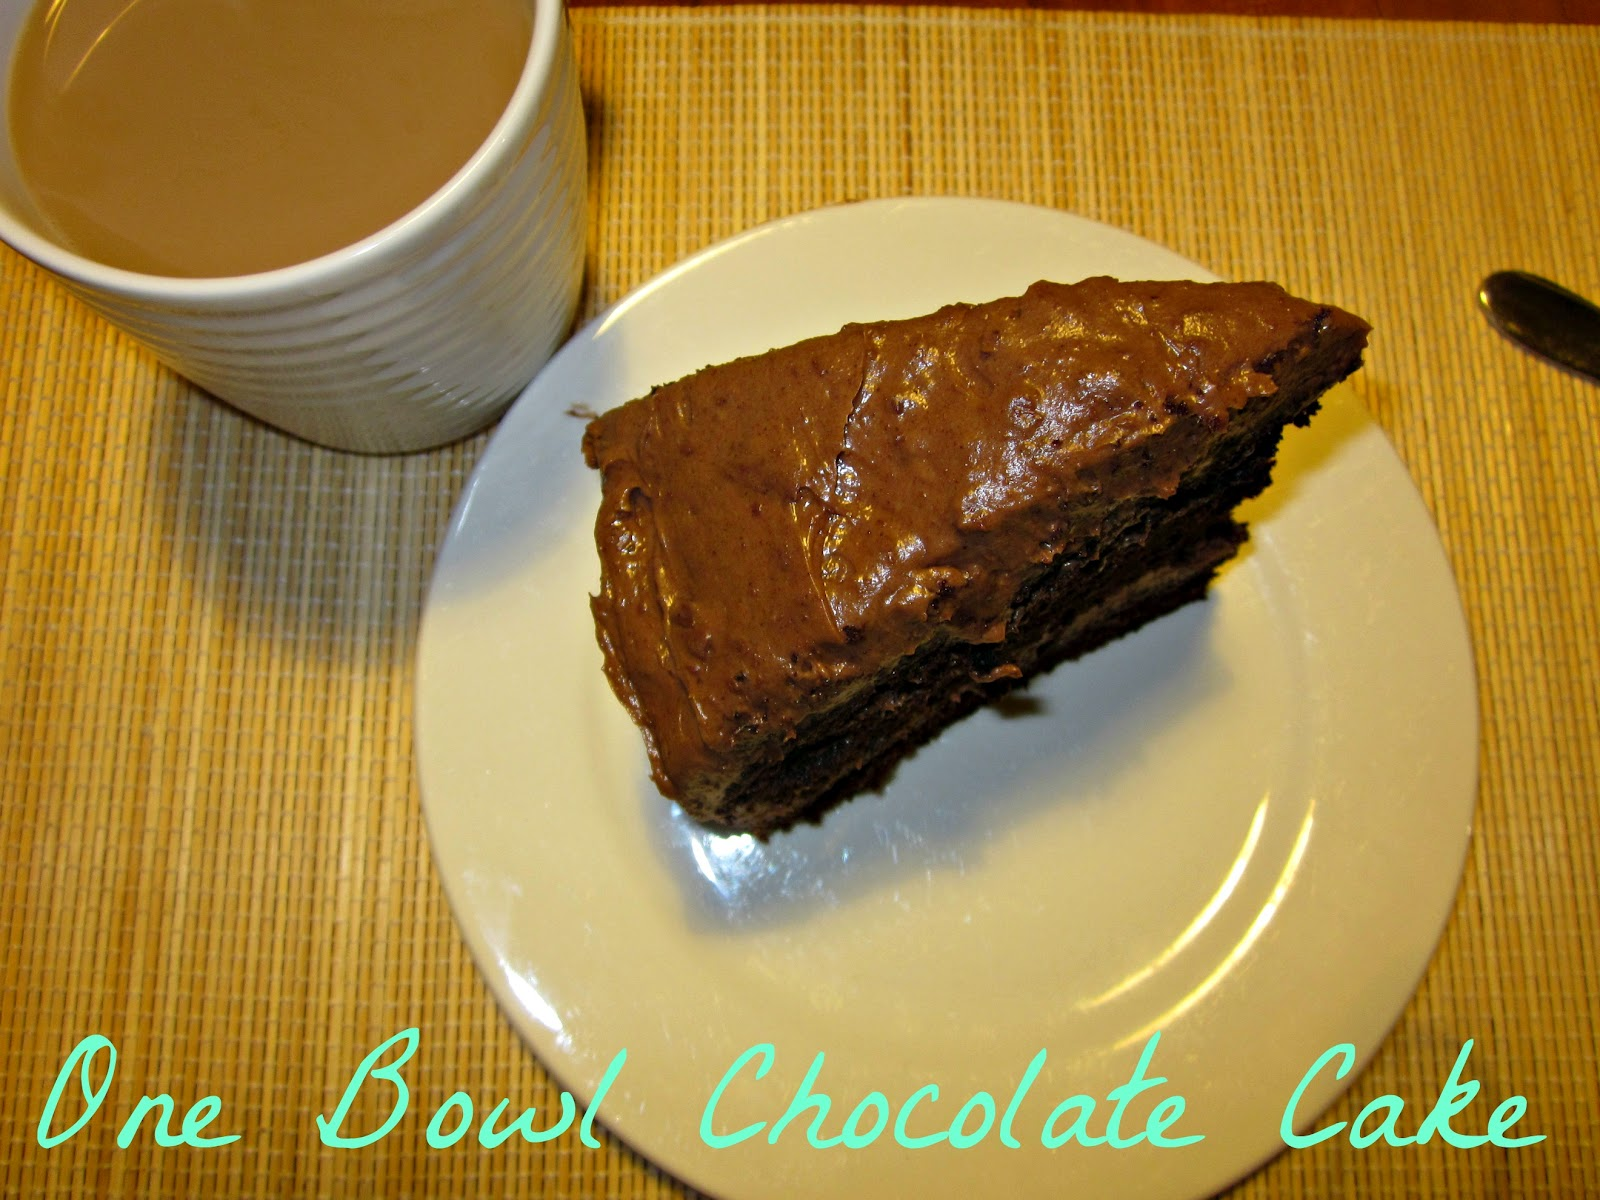 Boiled Chocolate Cake Icing